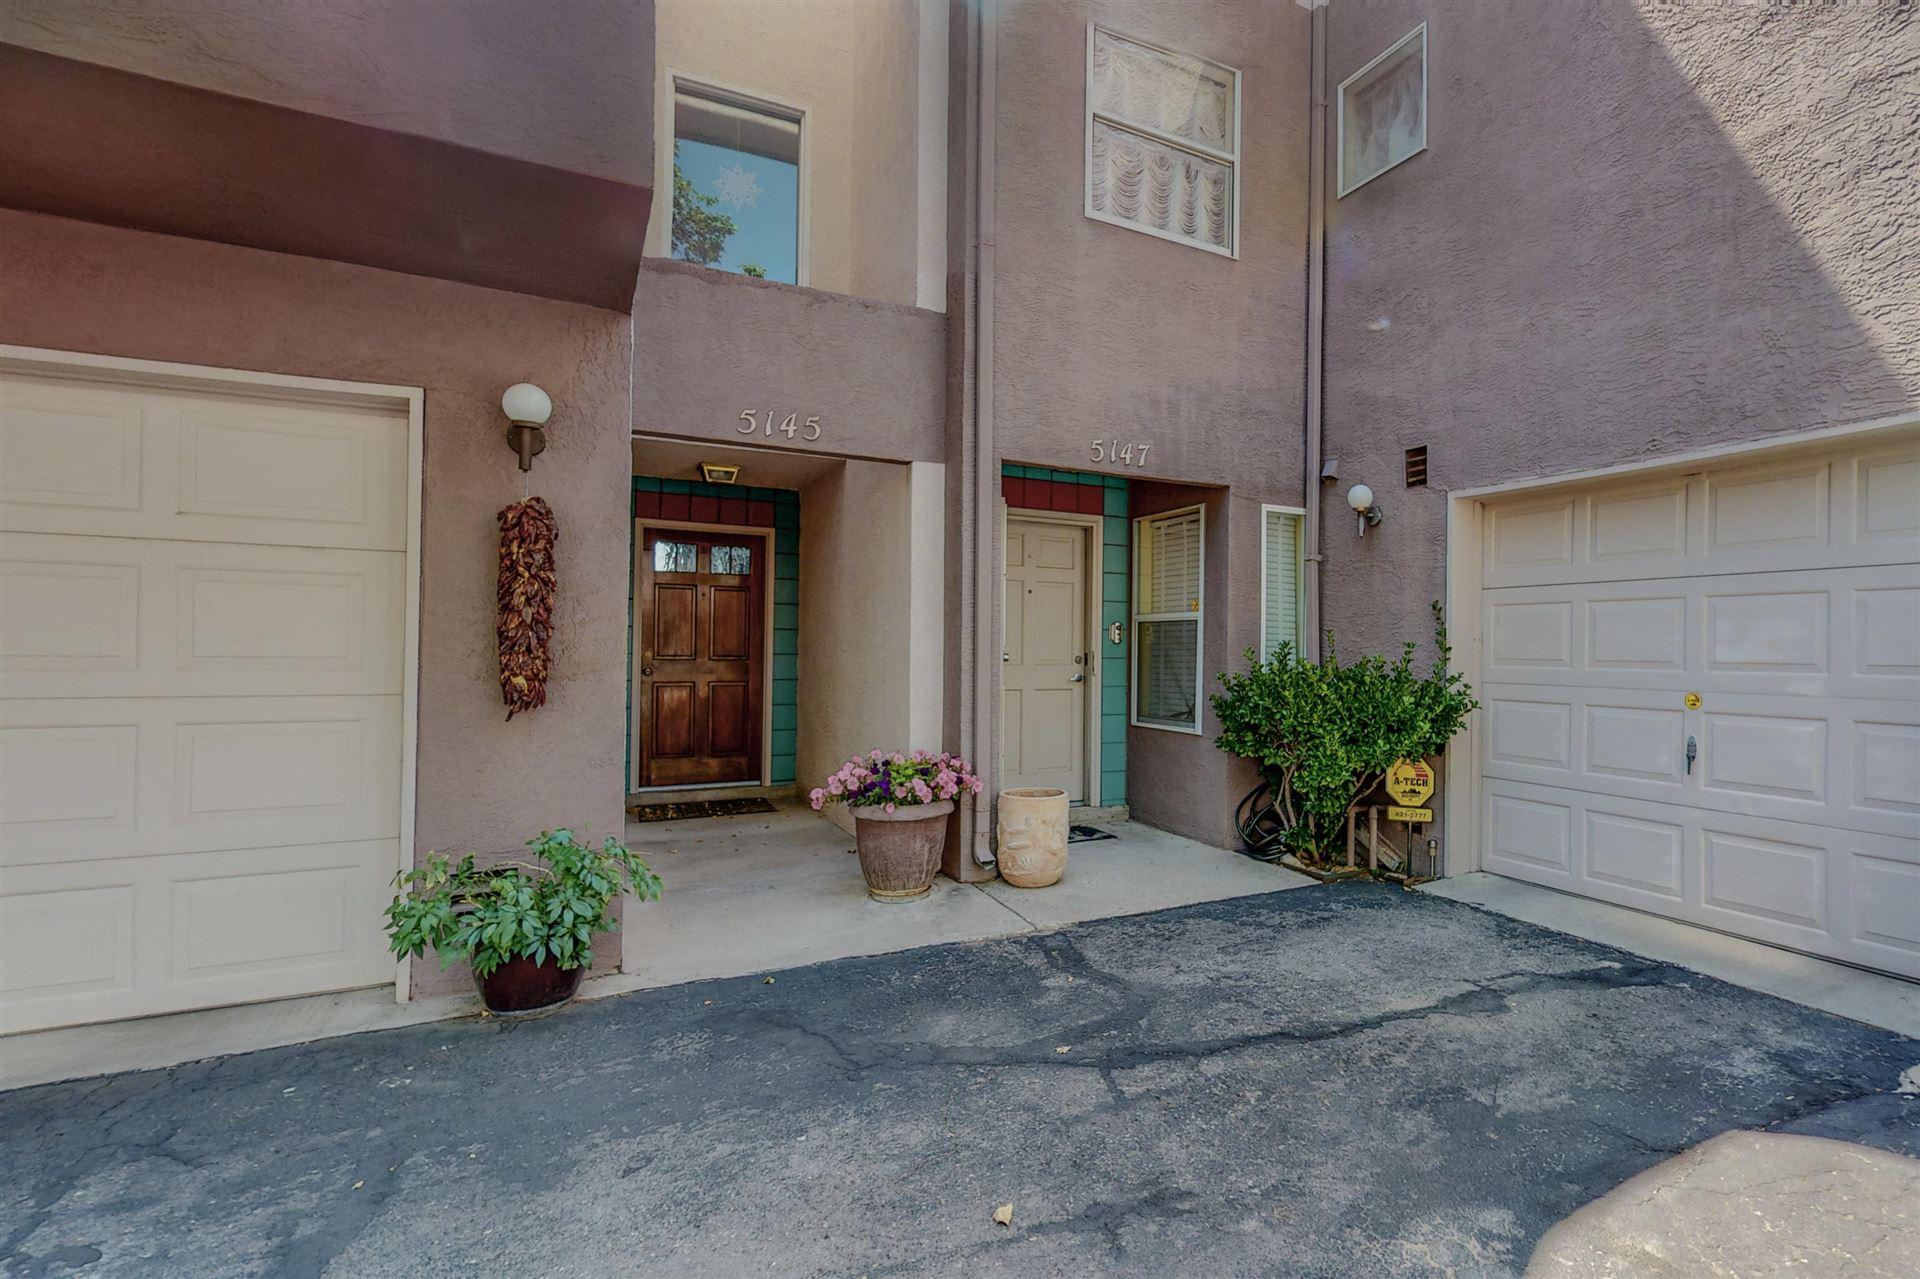 5147 Glenwood Pointe Lane NE, Albuquerque, NM 87111 - #: 994165